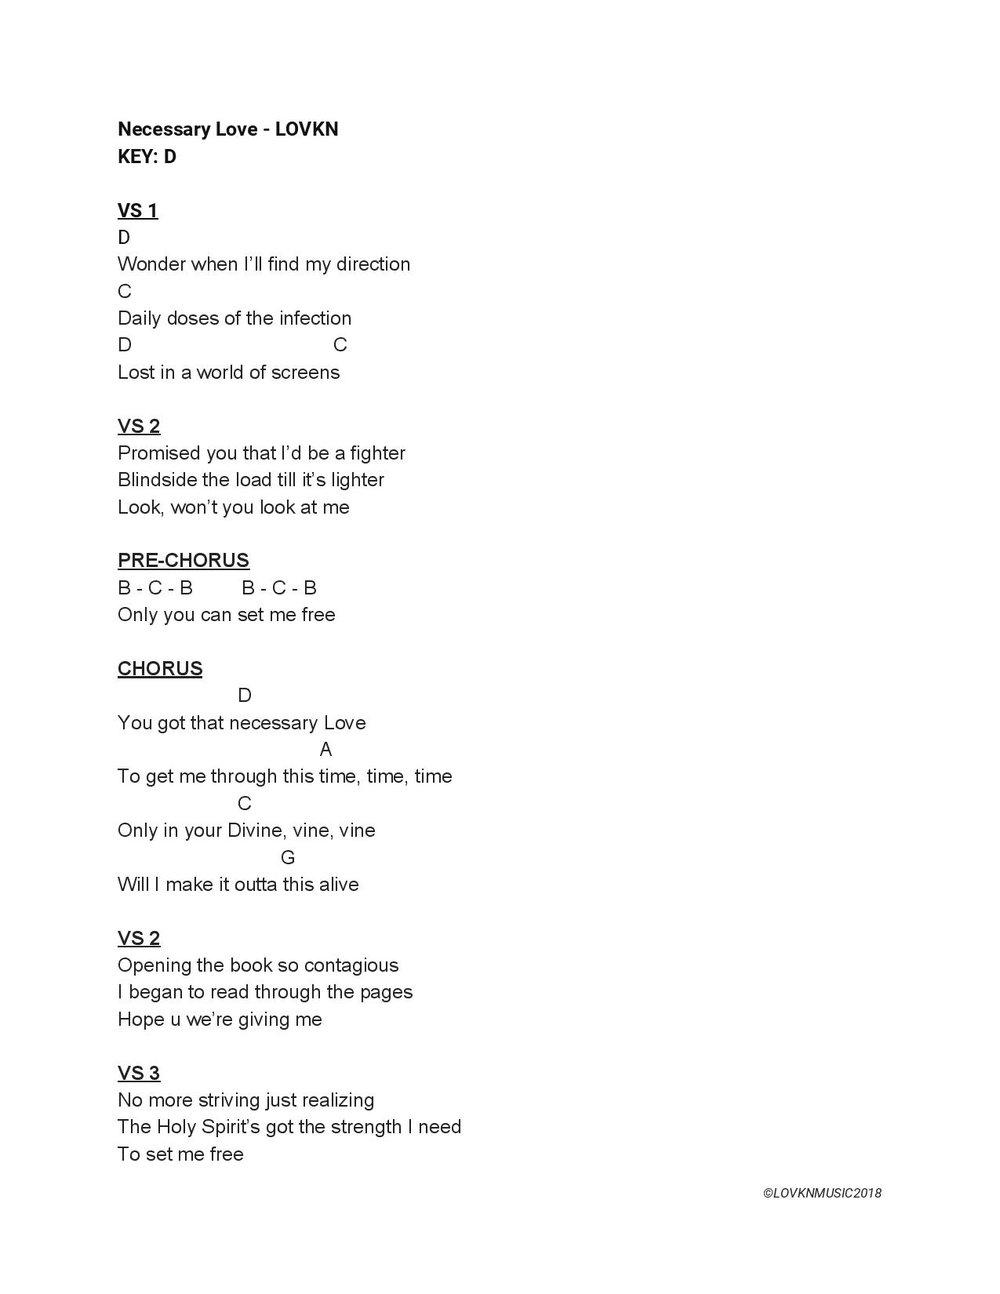 Necessary Love (1)-page-001.jpg